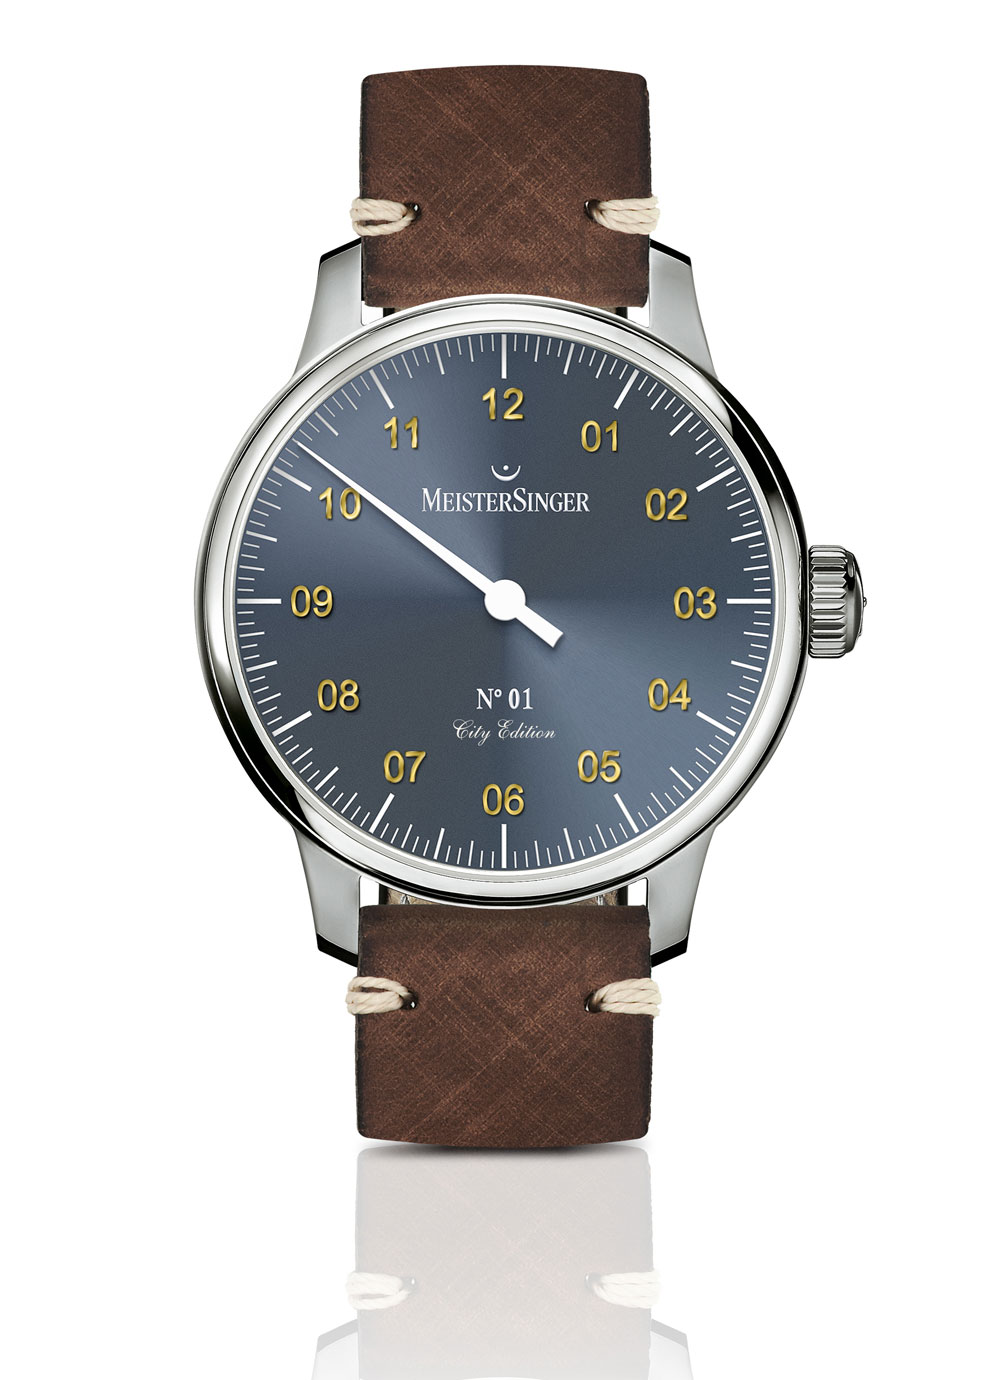 Reloj Meistersinger City Edition Barcelona